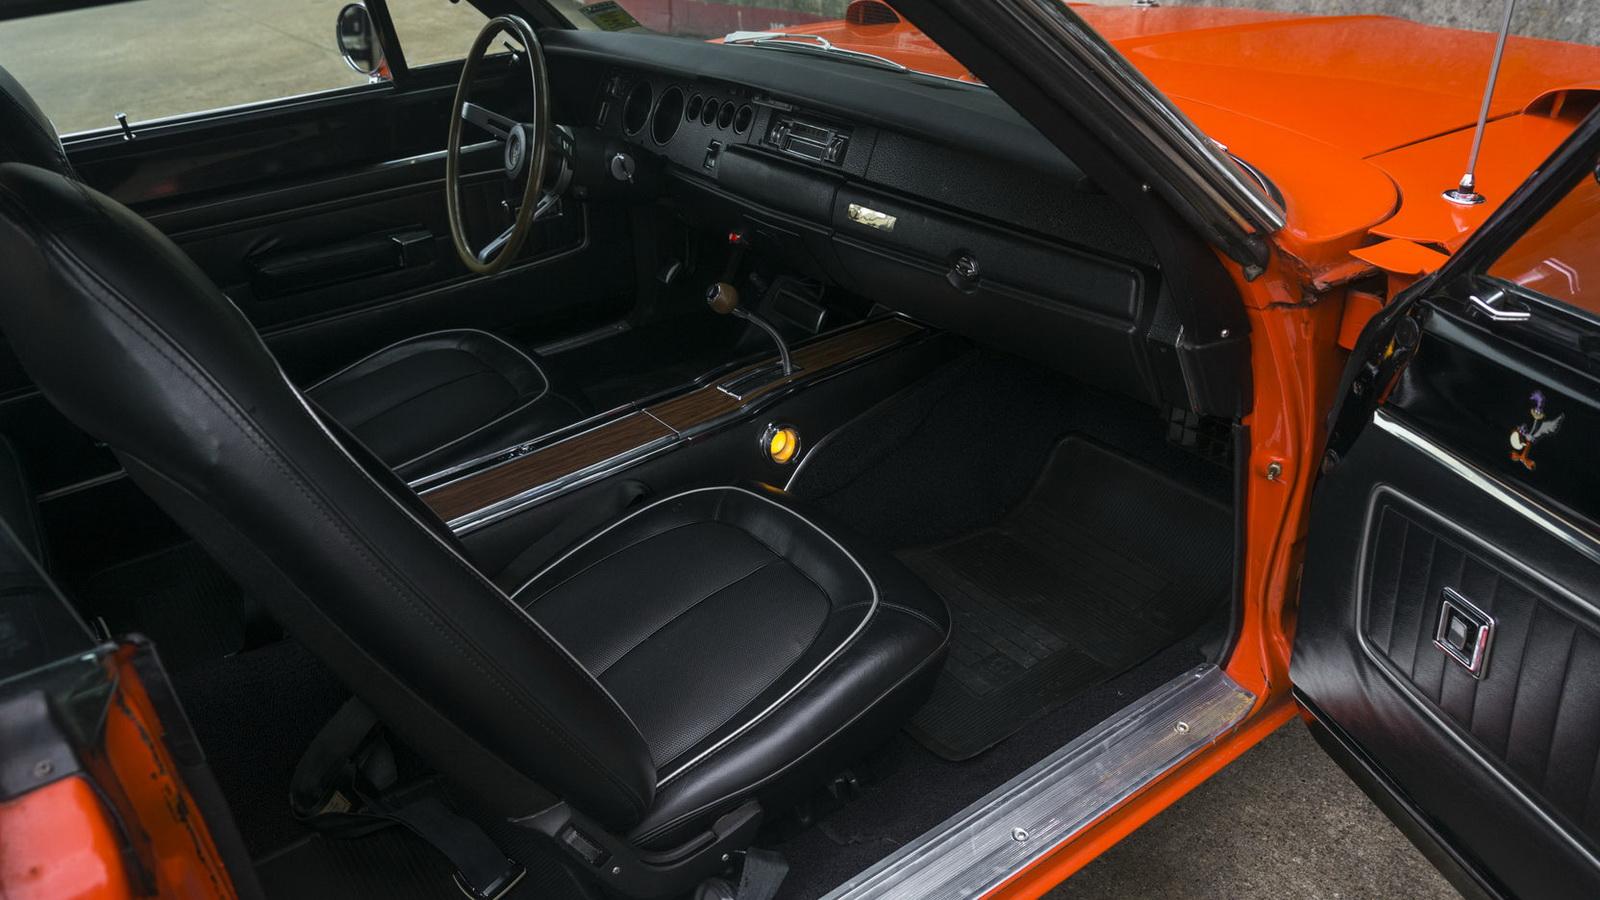 Plymouth Hemi Superbird 1970 in auction (5)